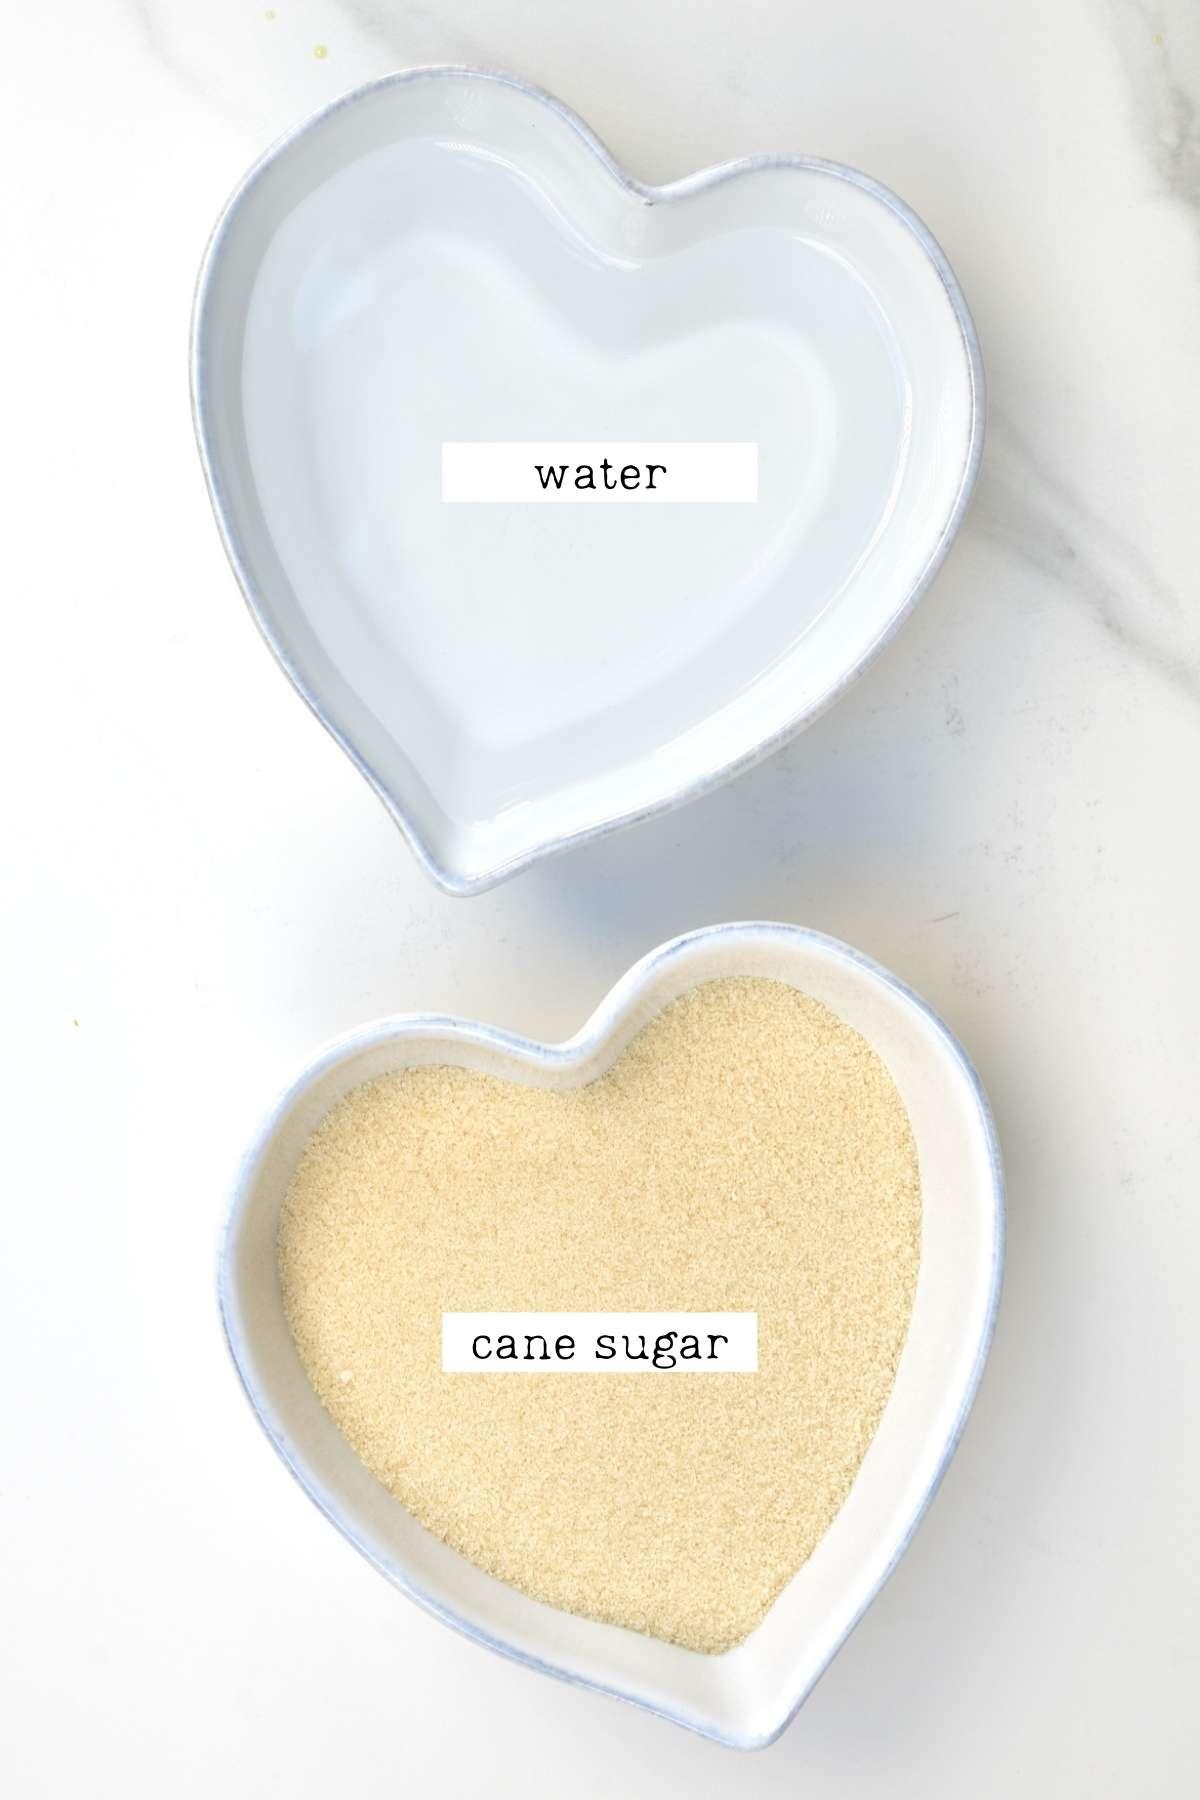 Ingredients for simple sugar syrup